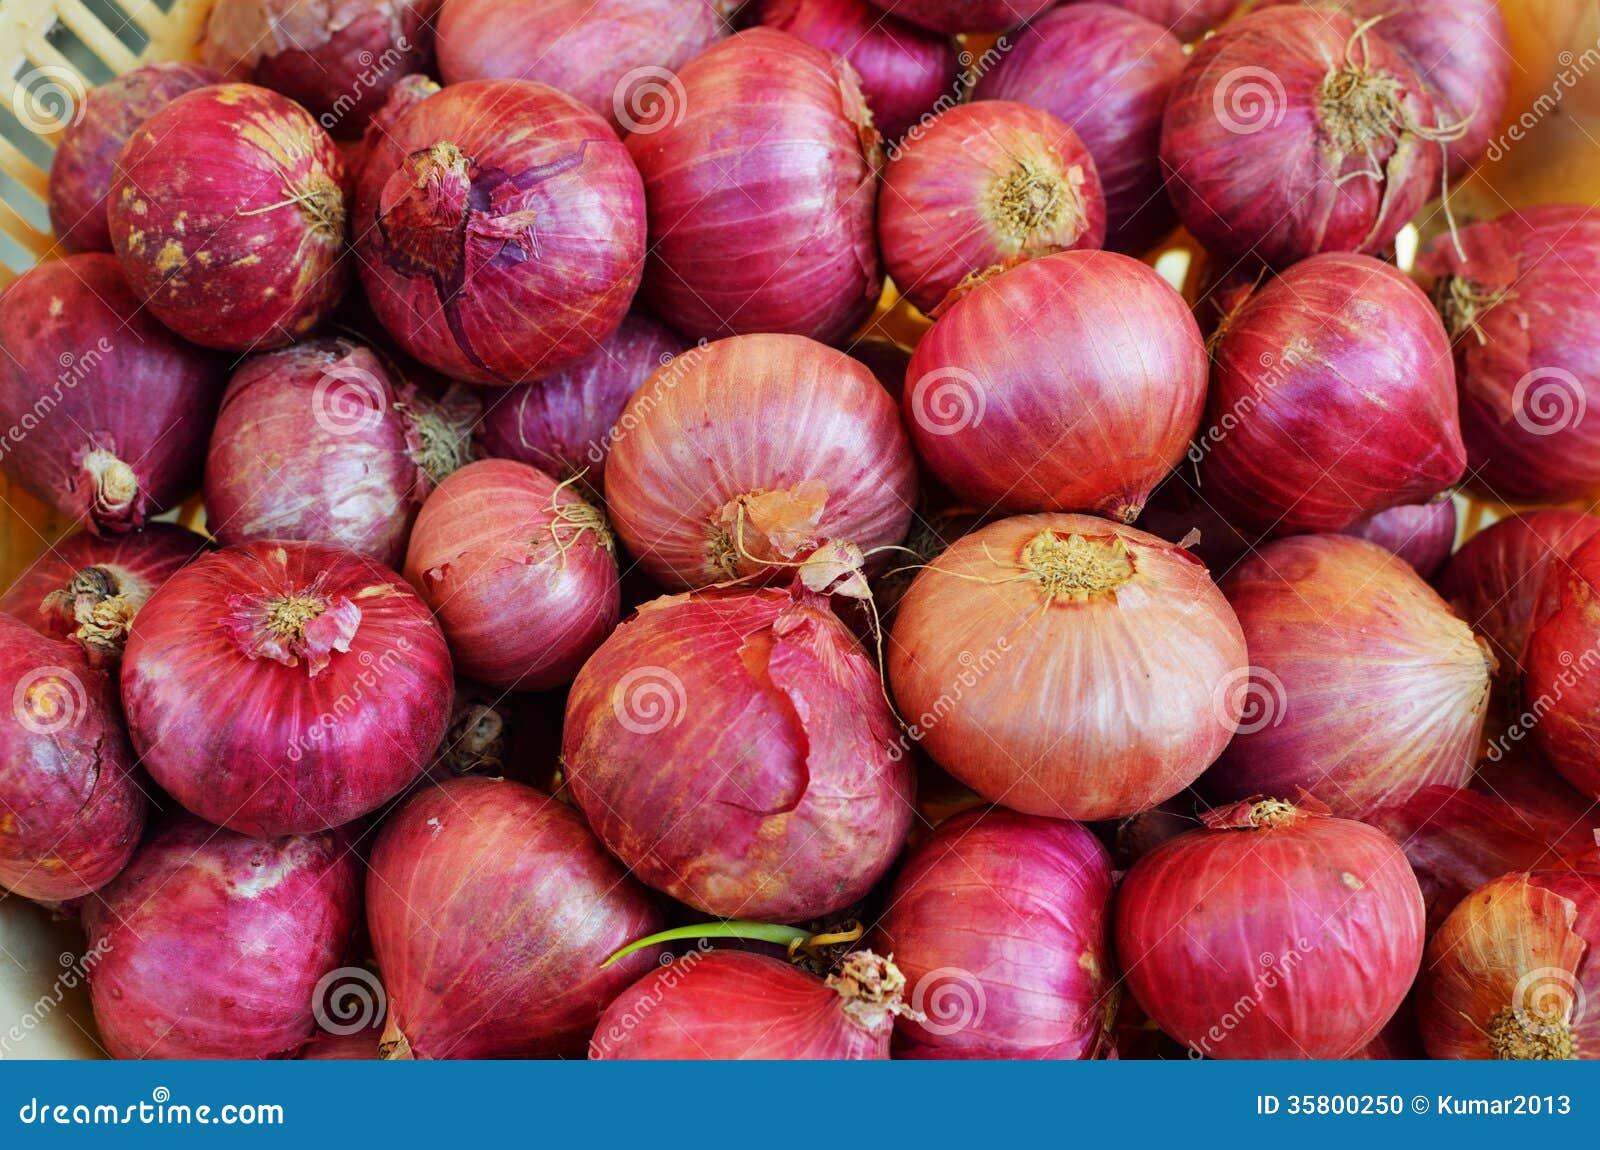 Onion or Allium cepa